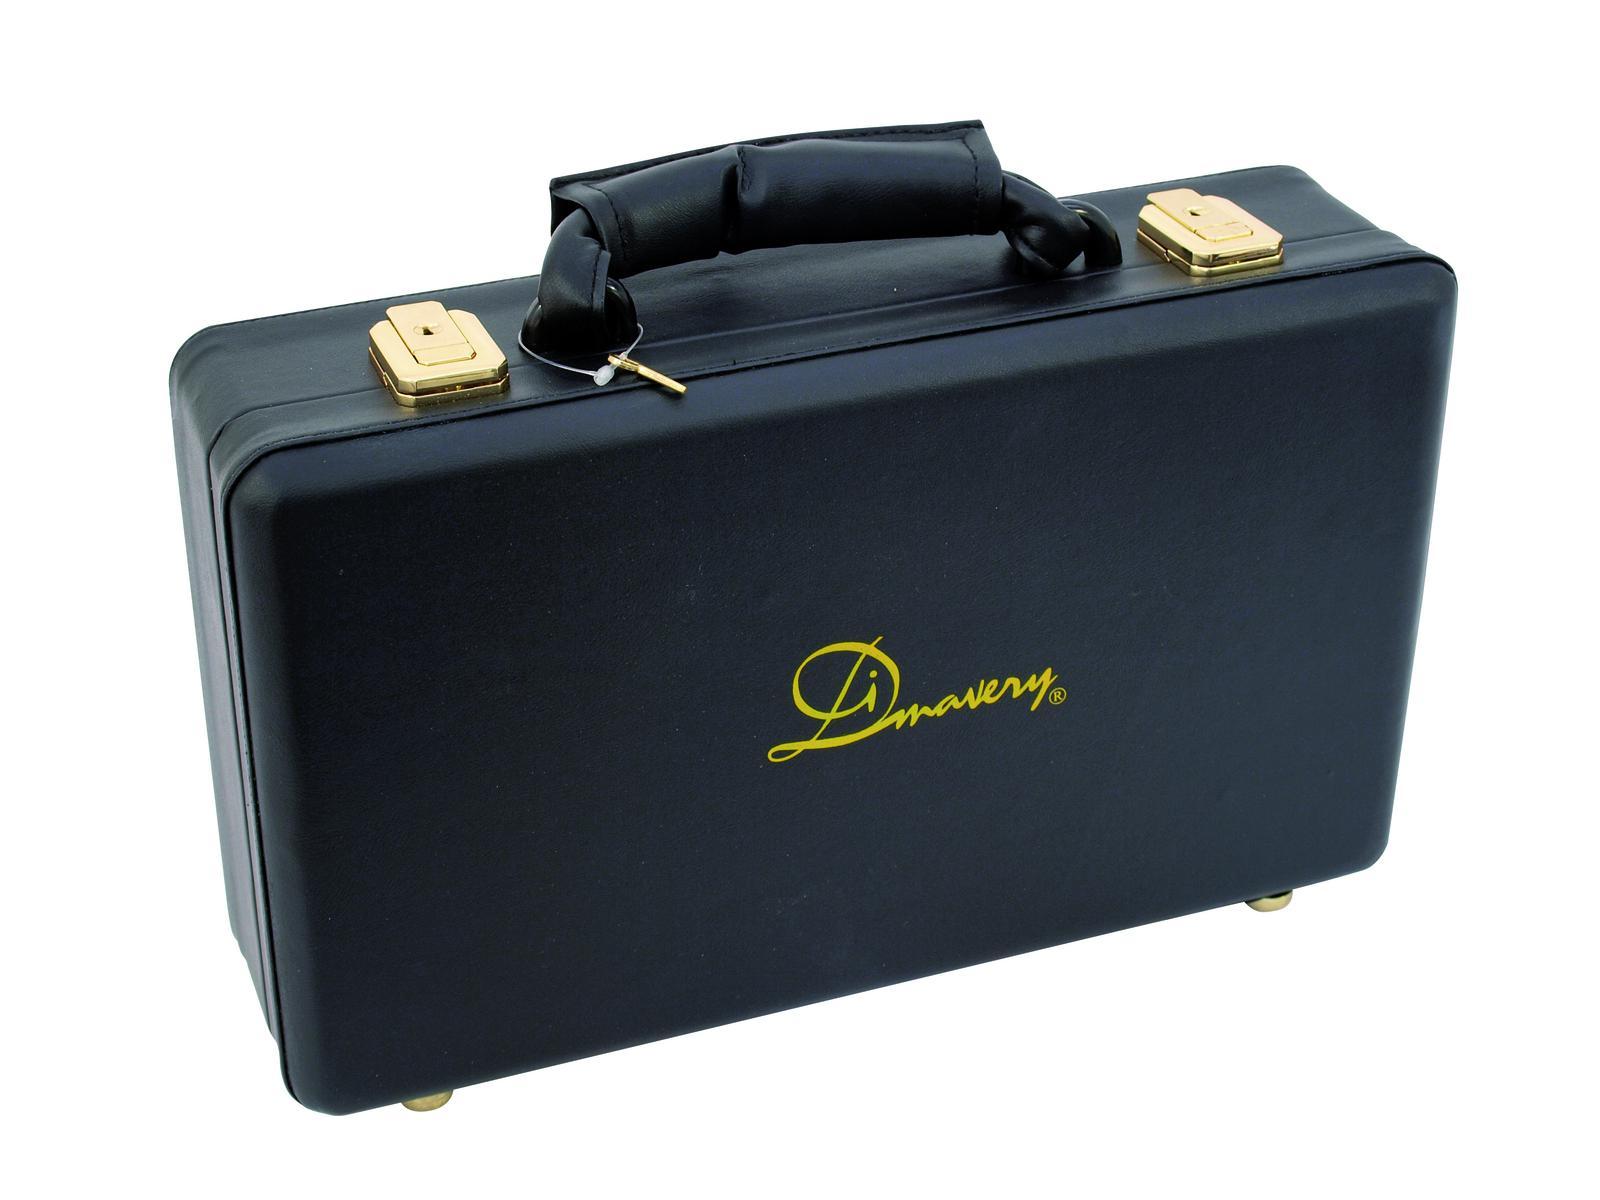 Dimavery kufr pro klarinet